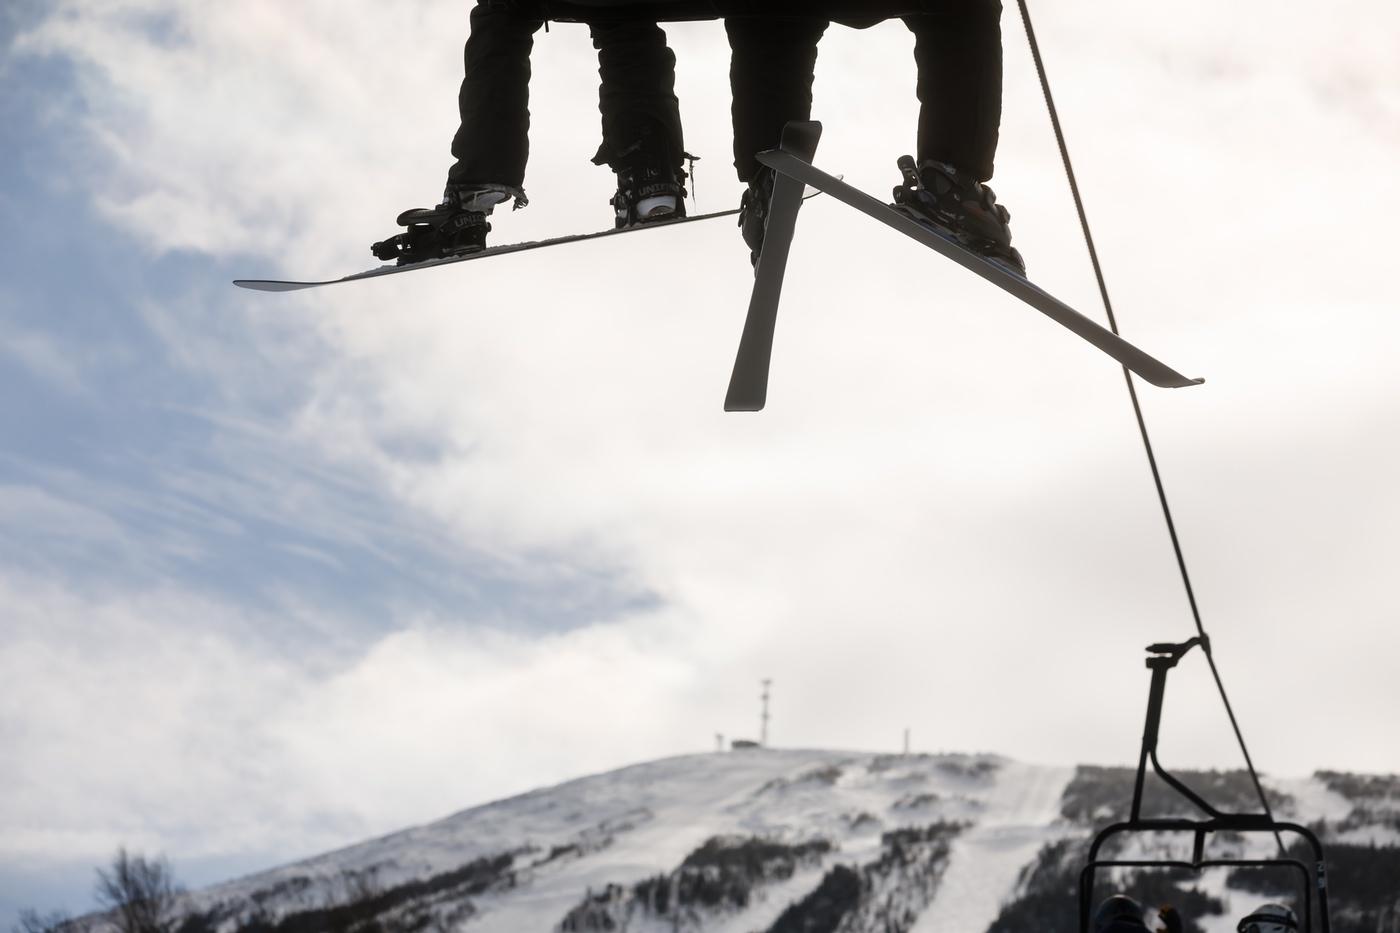 WinterKids Downhill 24 2021 SDP 3482